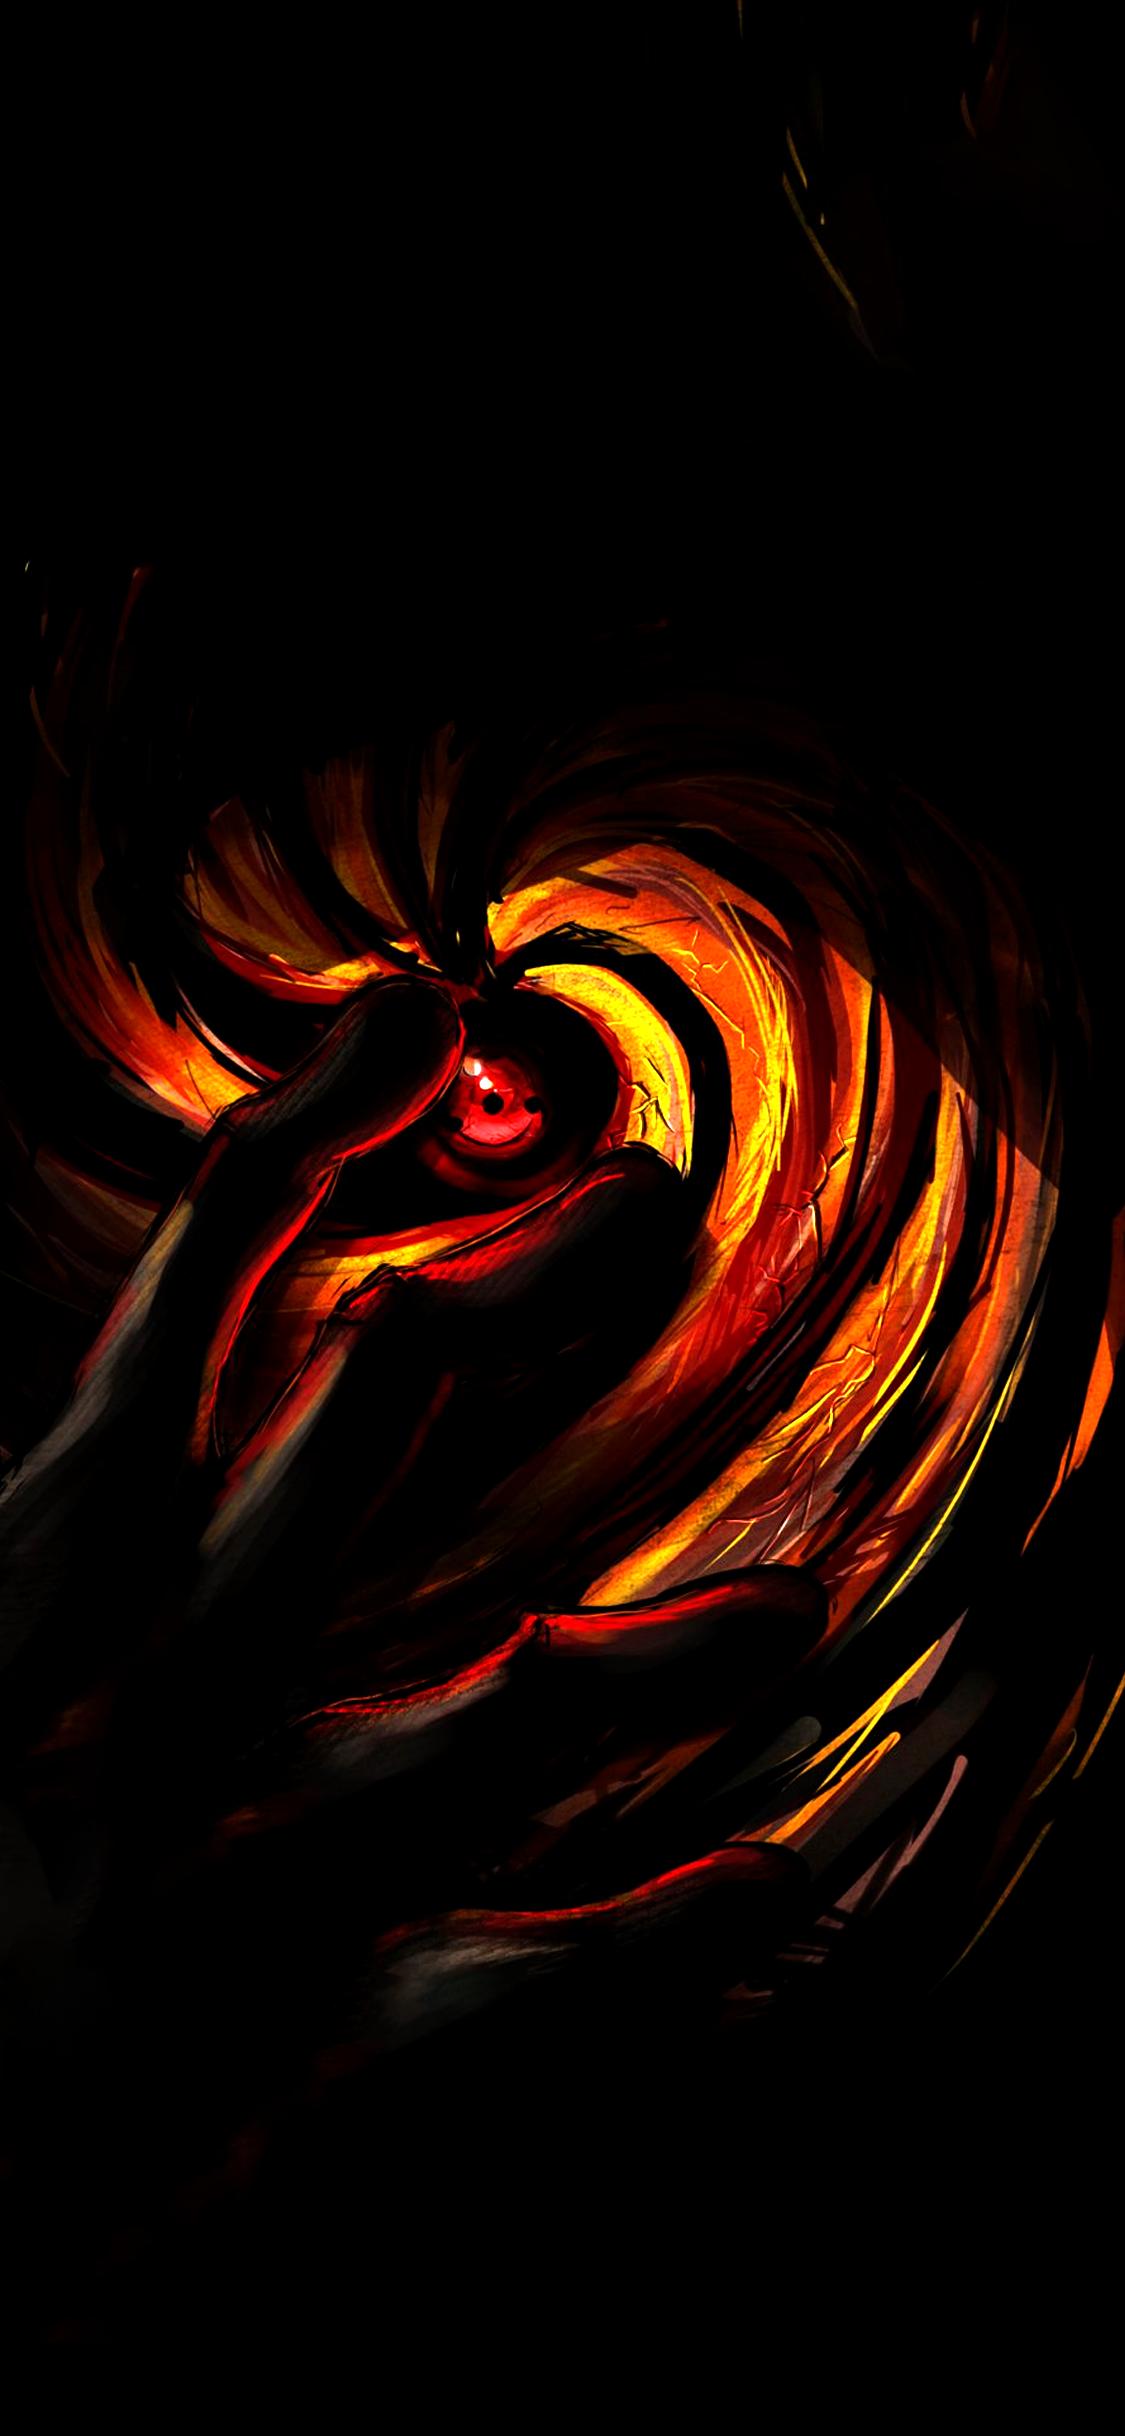 Naruto Iphone Xs Max Wallpapers Wallpaper Cave